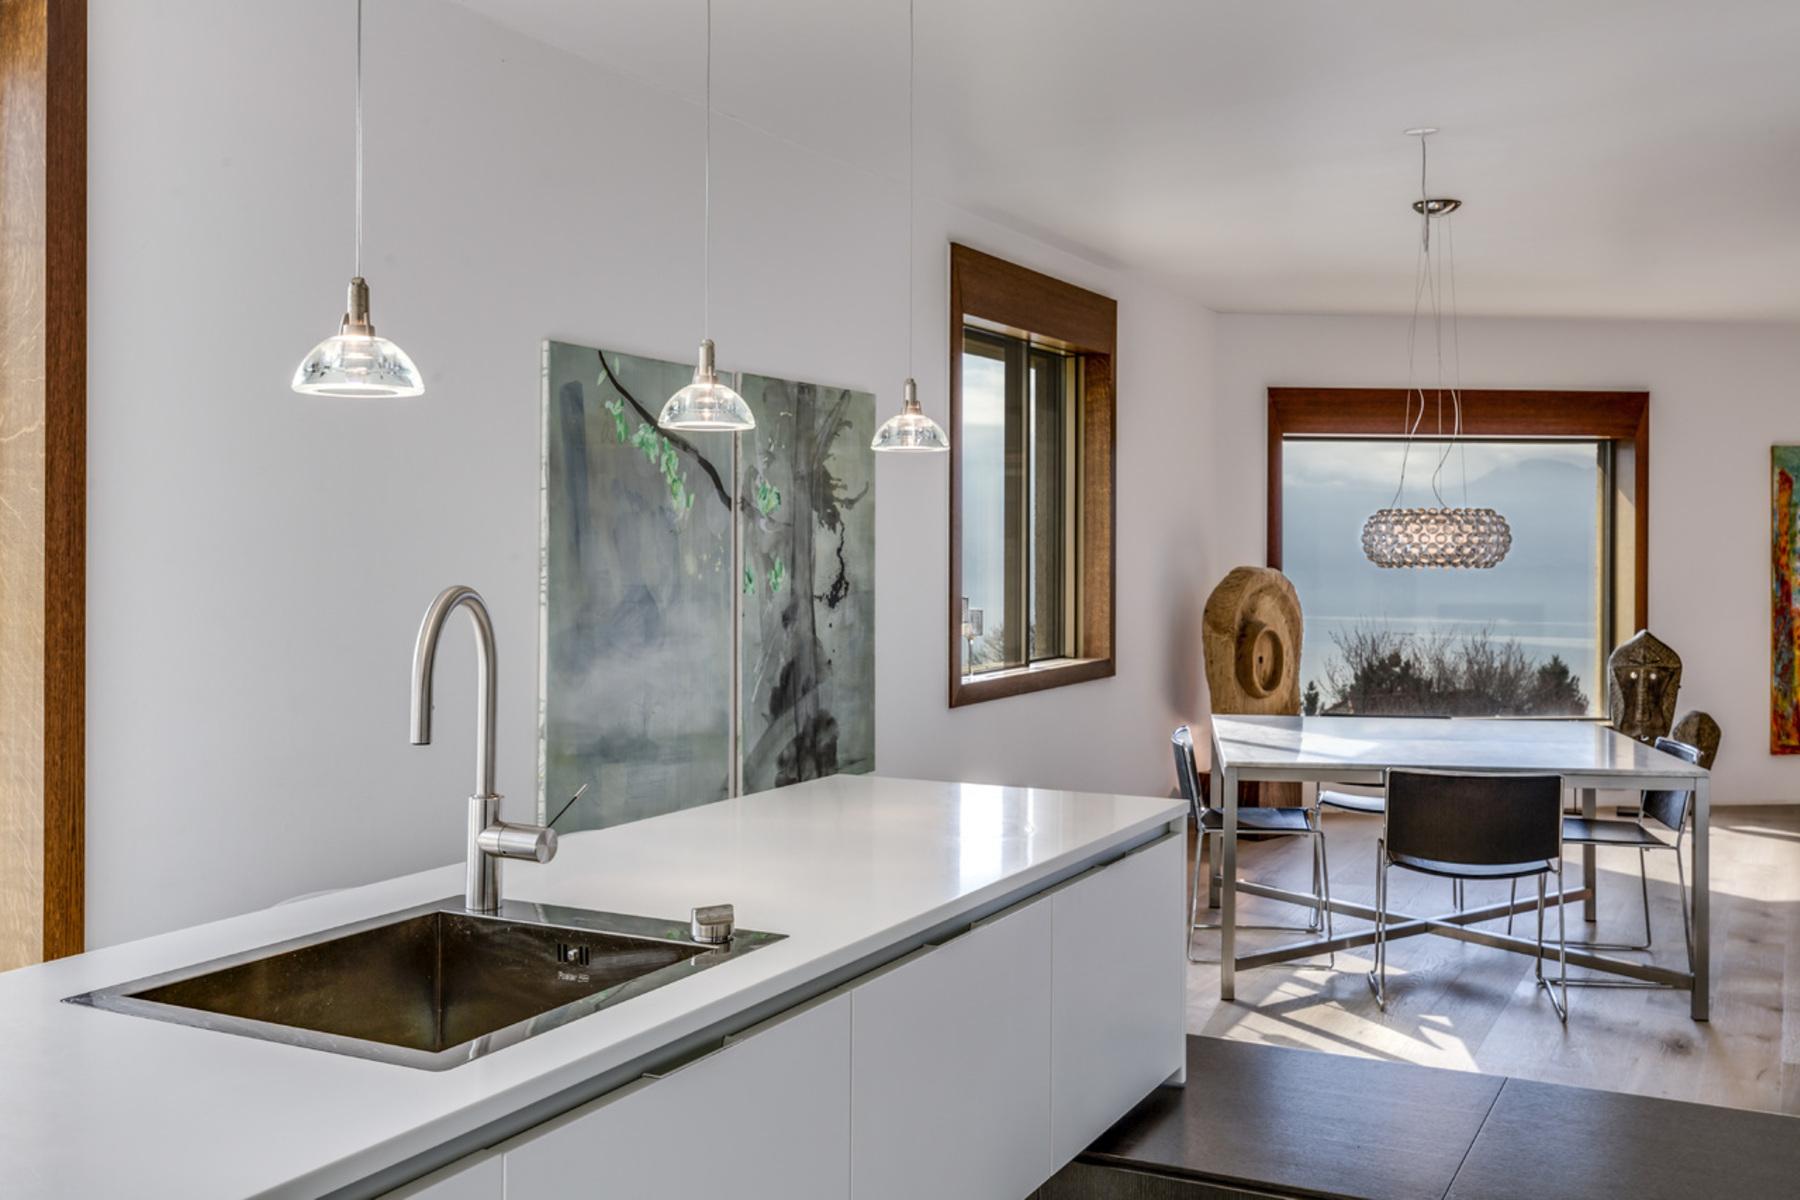 Condominium for Sale at For sale, Condominium apartment, 1095 Lutry, Réf 8732 Lutry - La Conversion Lutry, Vaud, 1095 Switzerland